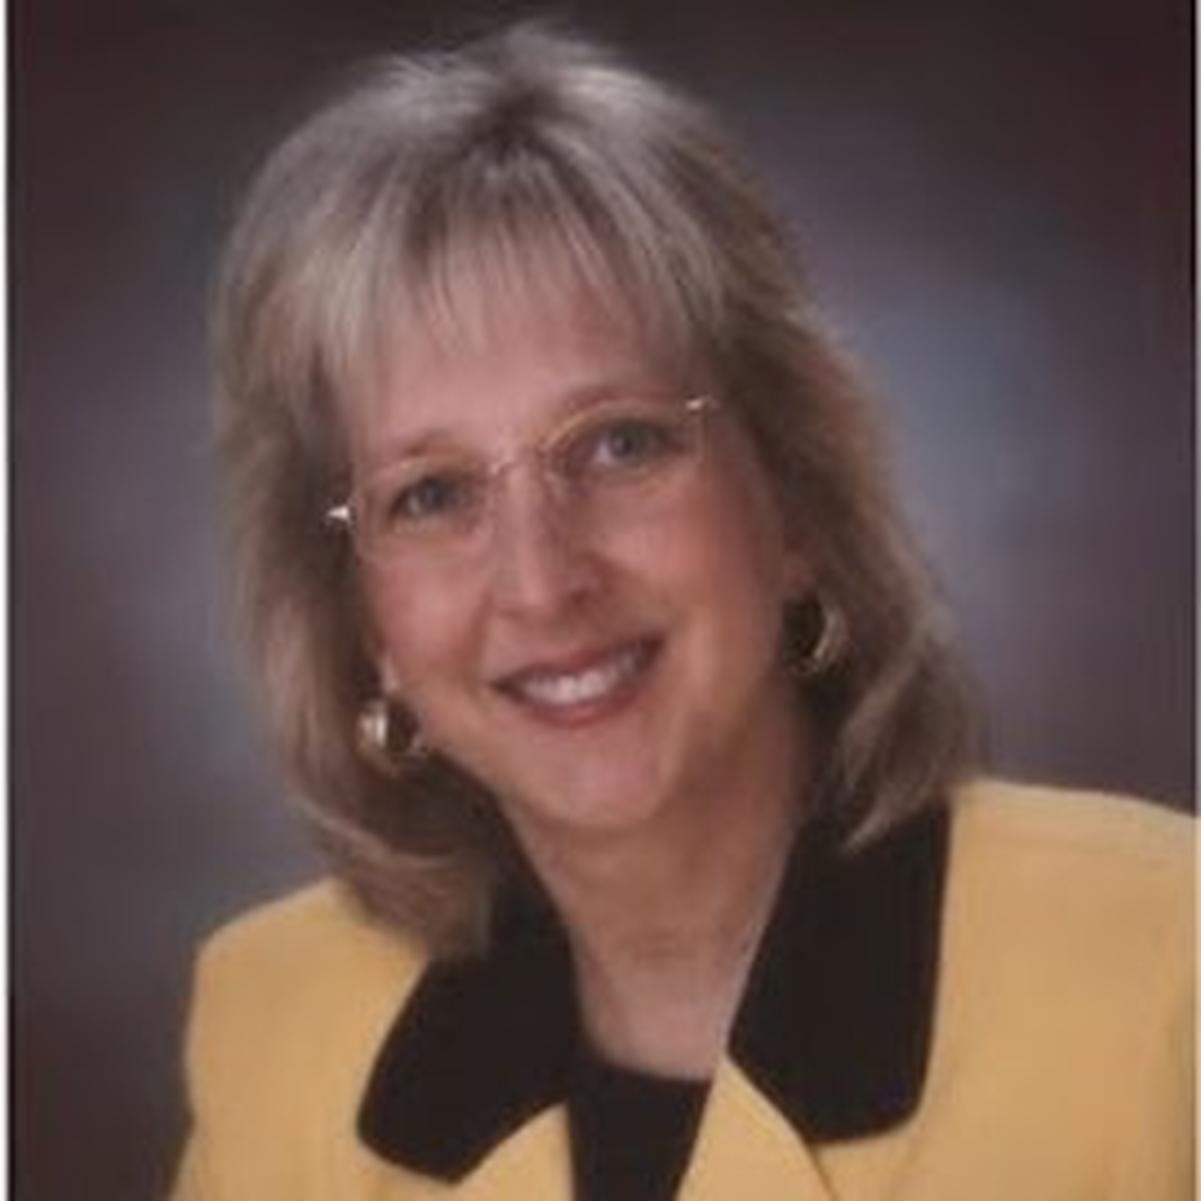 Wendy Mannering